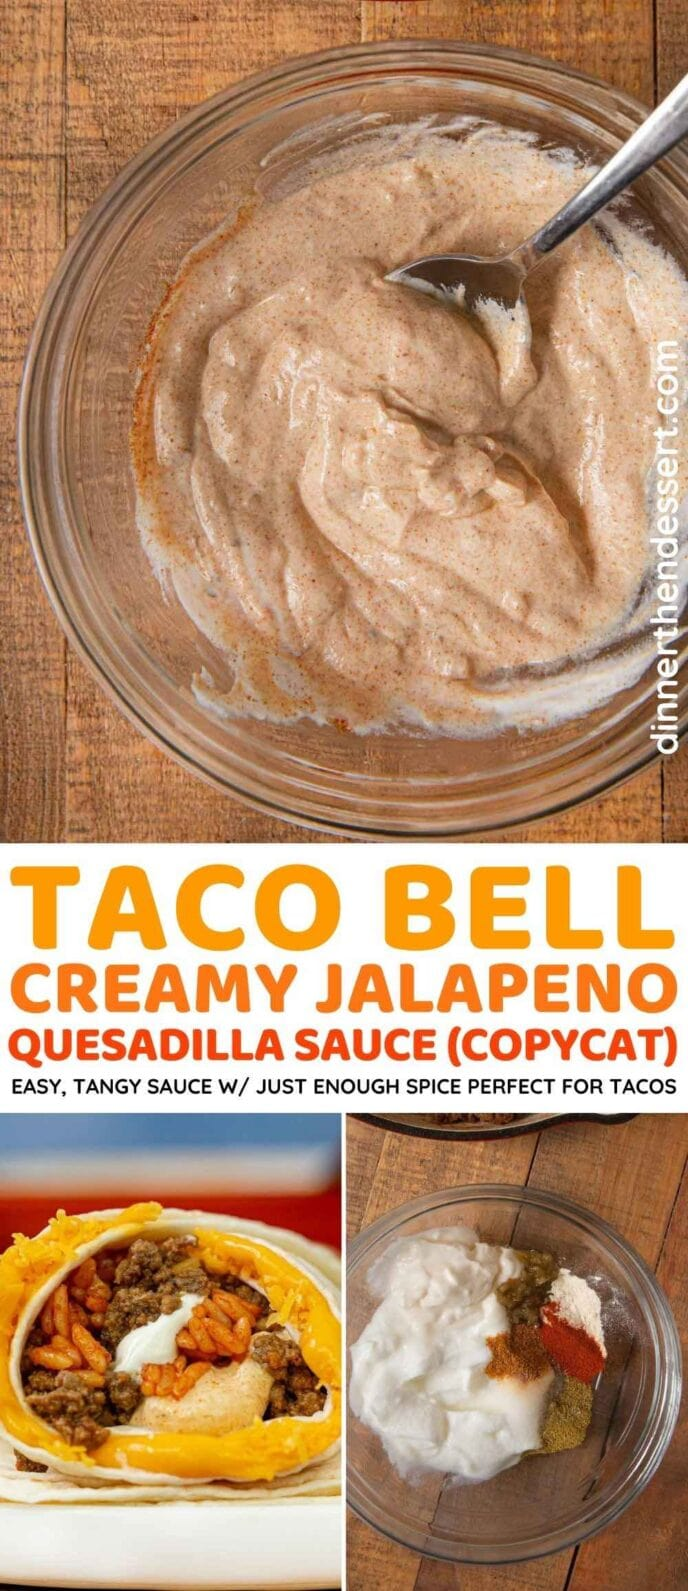 Taco Bell Creamy Jalapeno Quesadilla Sauce (Copycat) collage